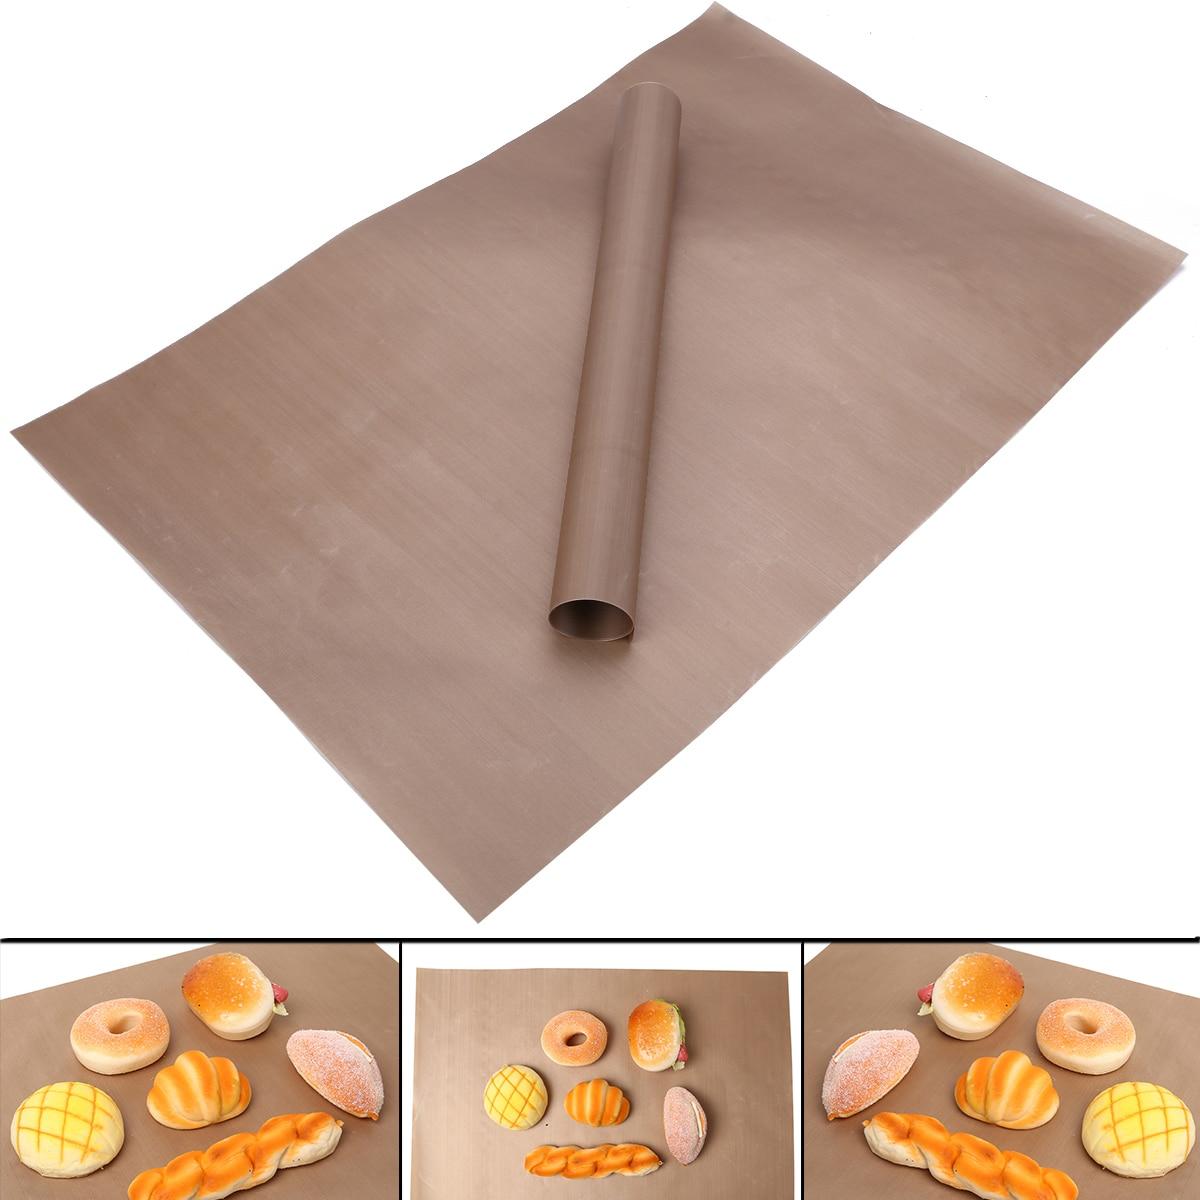 Mayitr, 2 uds., estera para hornear Parrilla de barbacoa, estera antiadherente, esteras para parrilla de barbacoa al aire libre, utensilios para hornear de cocina resistentes al calor